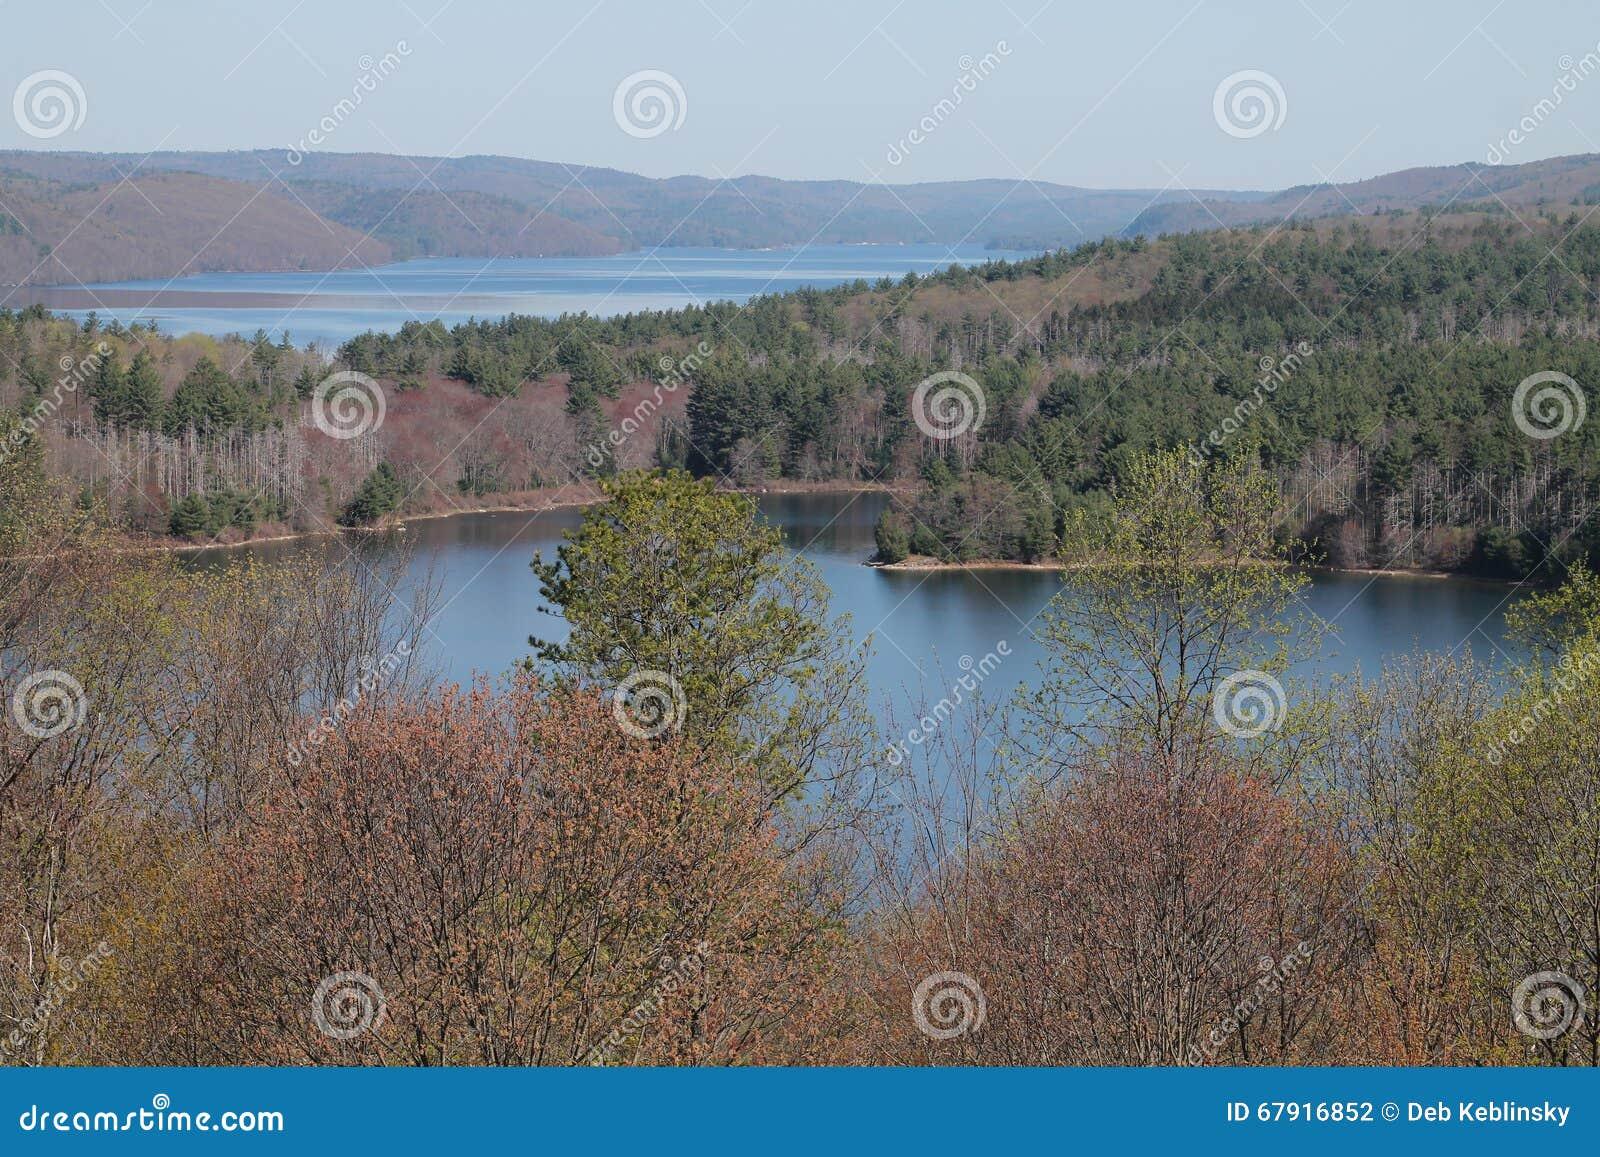 Quabbinreservoir Massachusetts